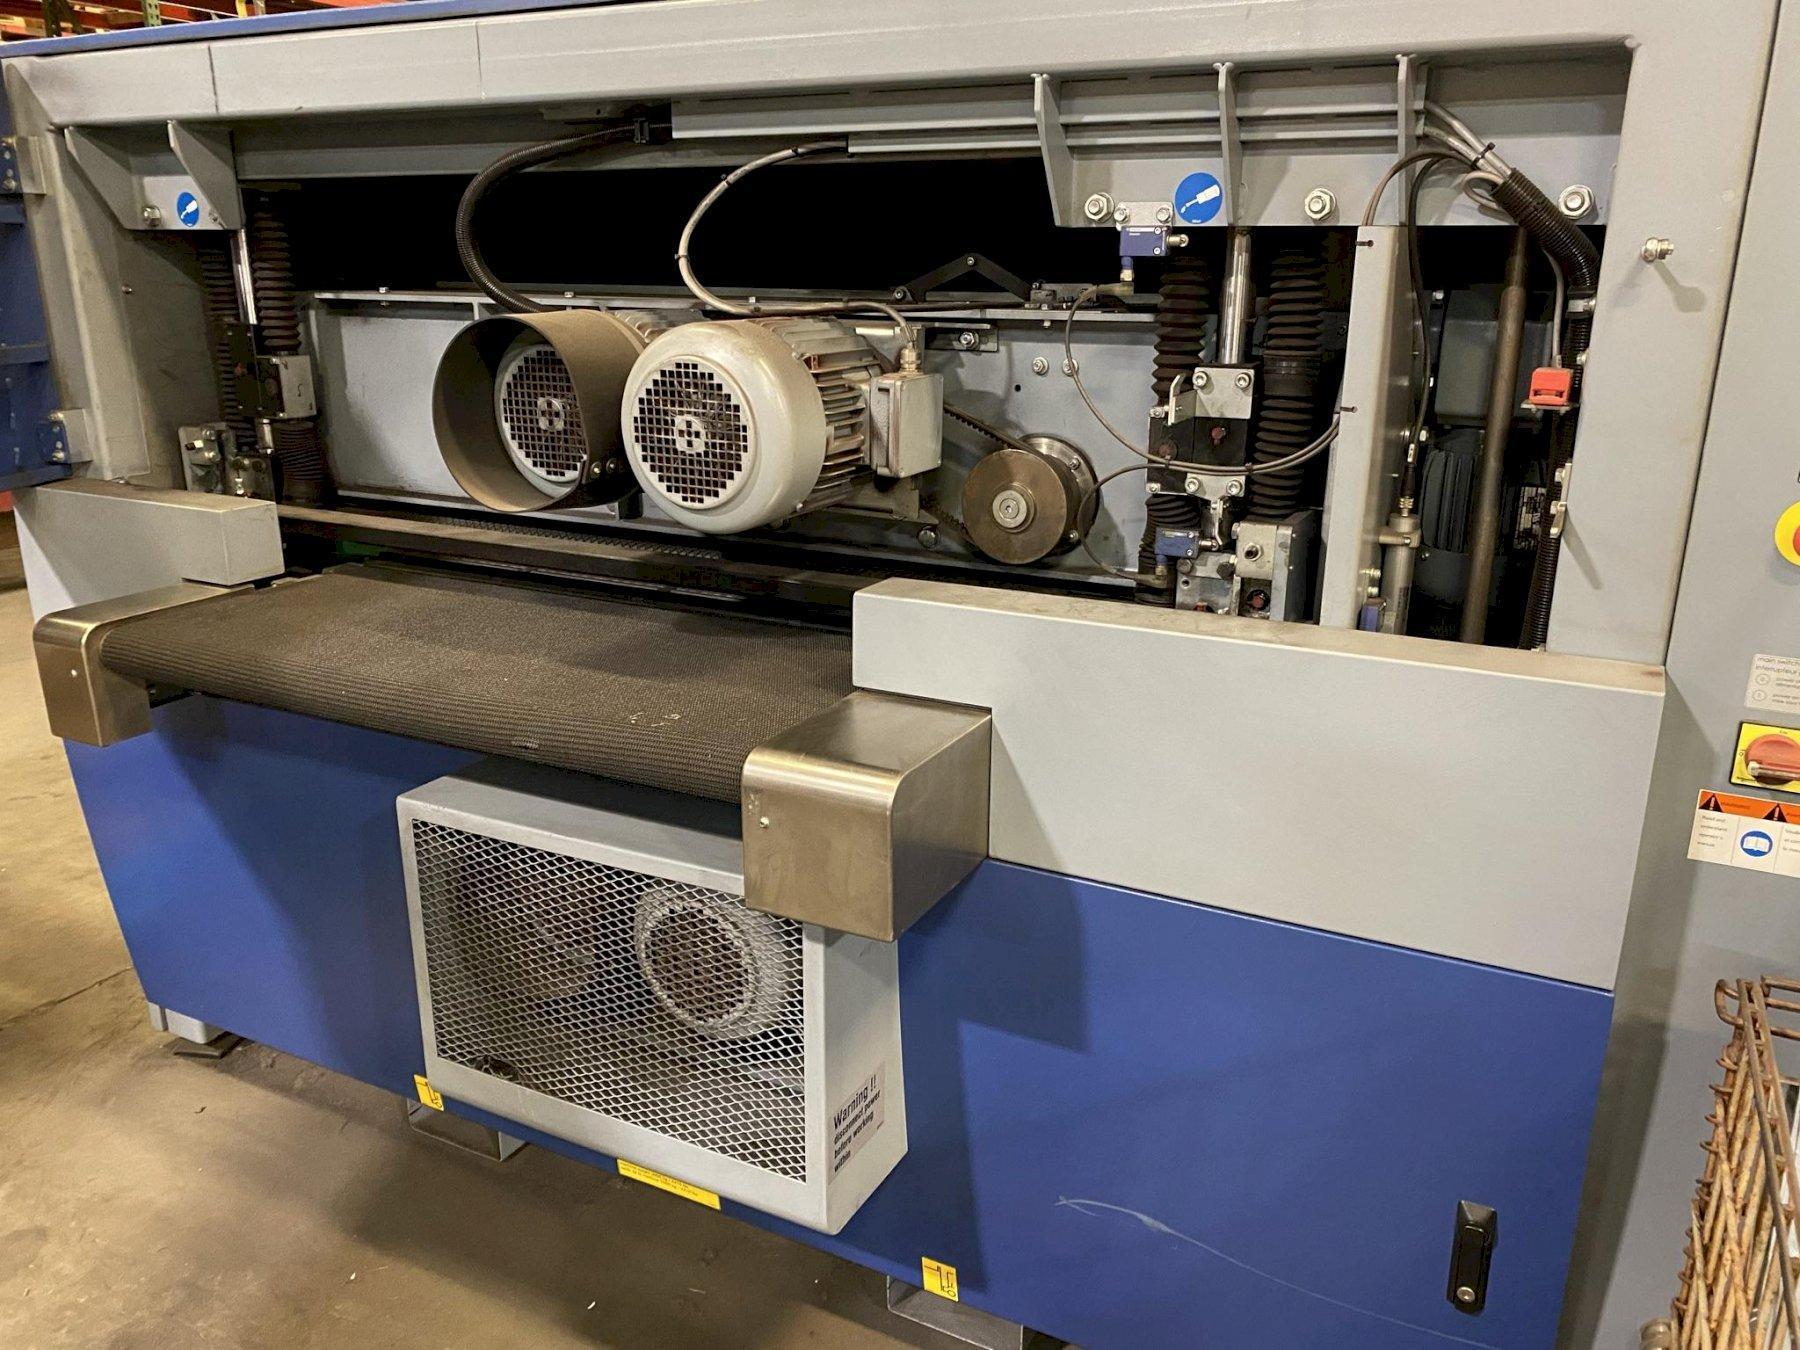 USED LISSMAC DUAL SIDED DEBURRING MACHINE, Stock# 10885, Year: 2014